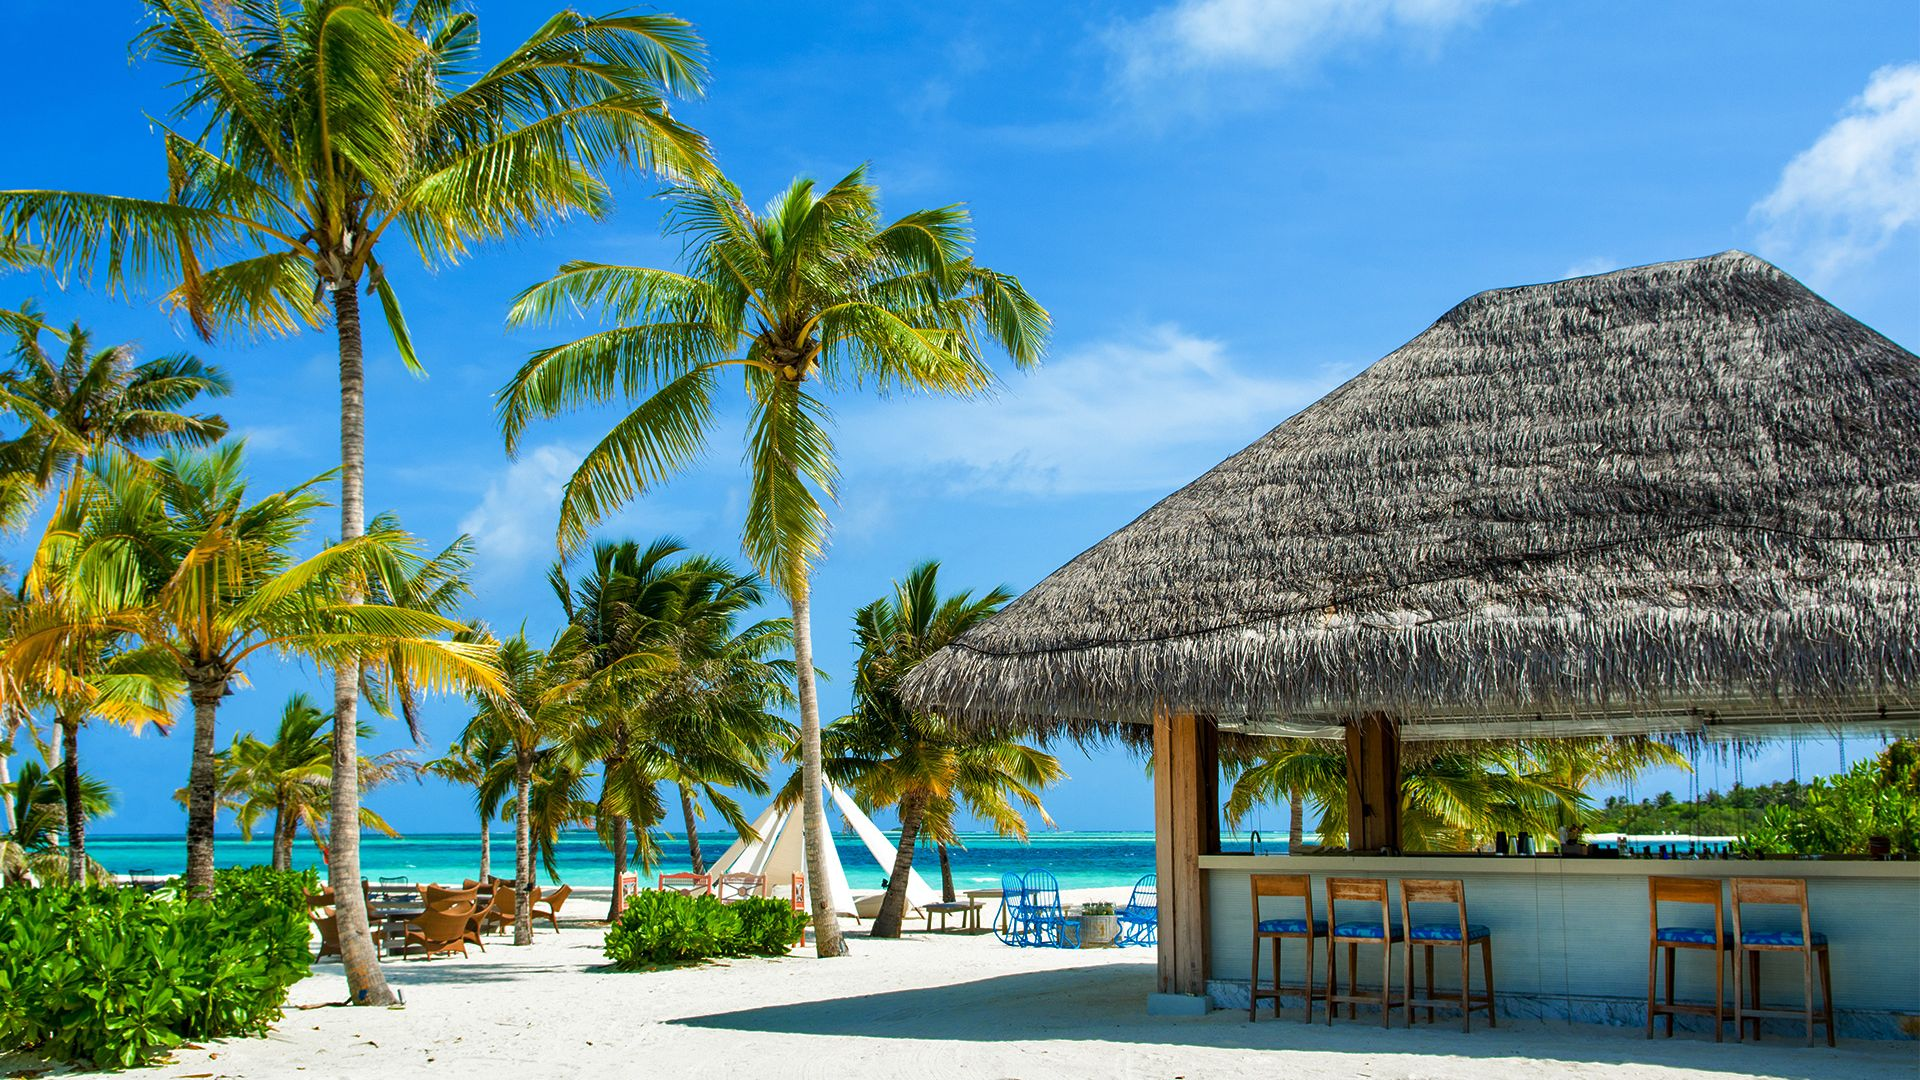 Sejur plaja Maldive, 10 zile - ianuarie 2022